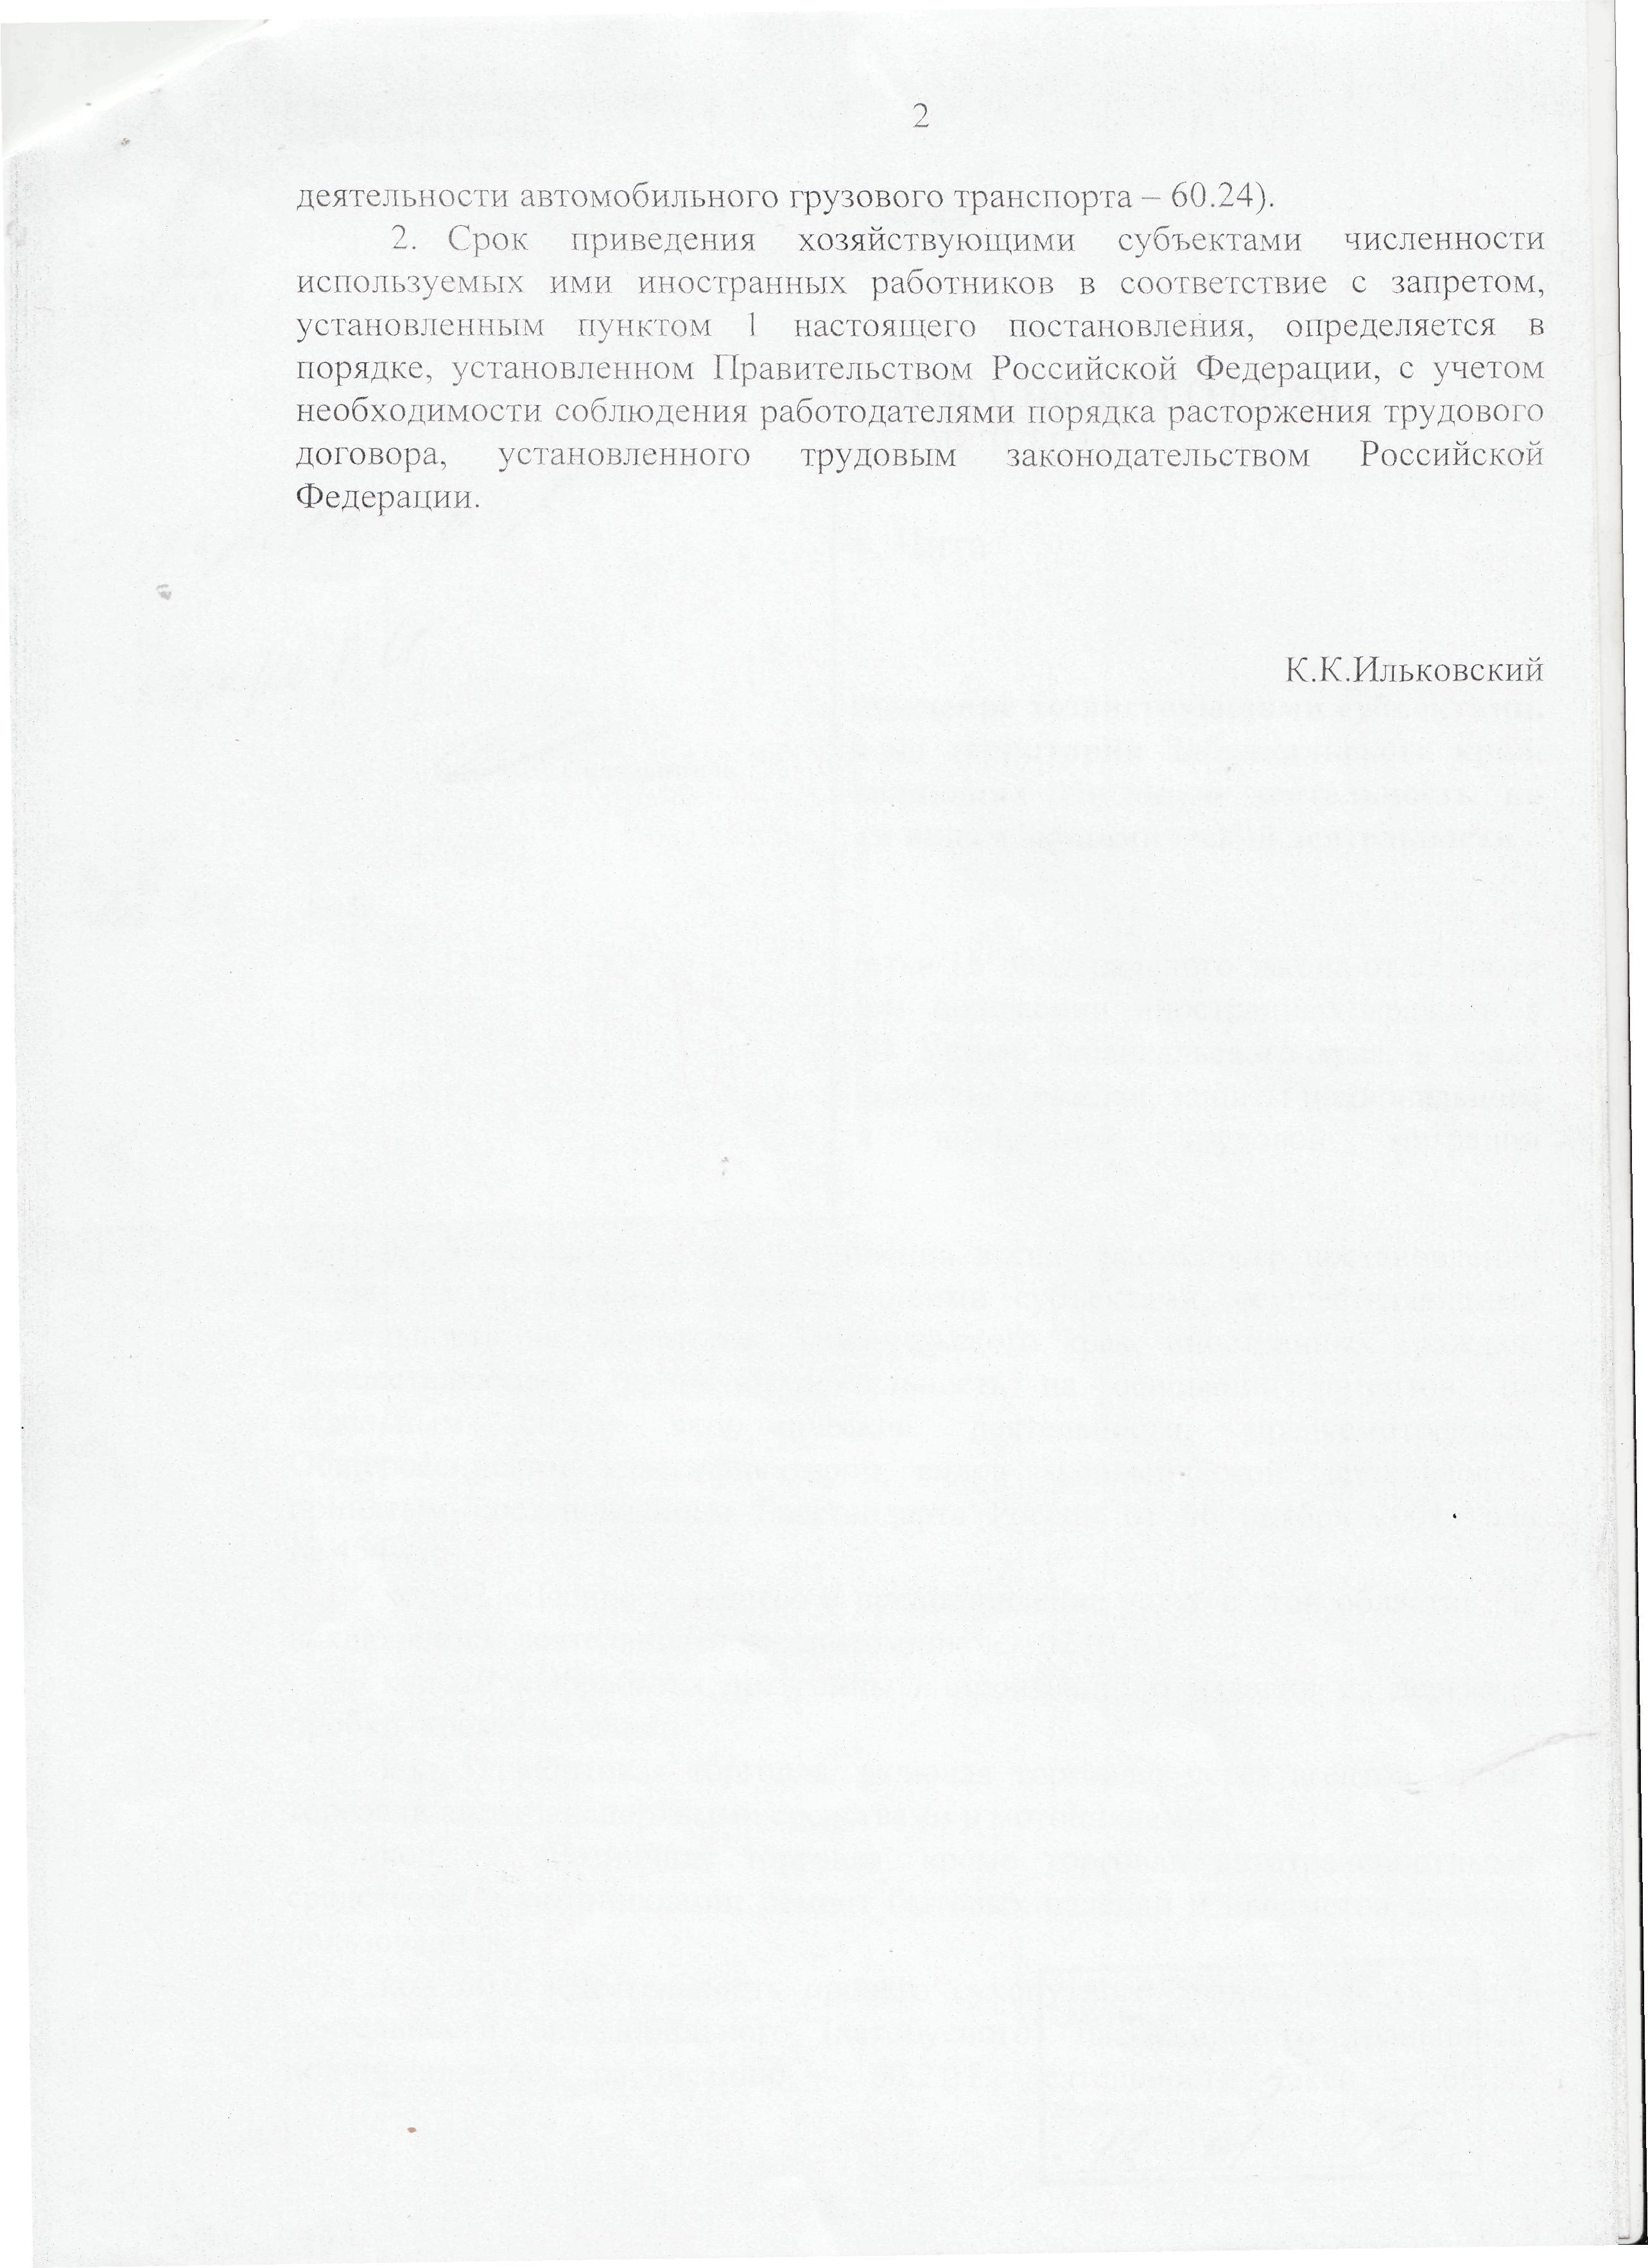 Постановление Губернатора Заб.края от 30.12.2014 83.